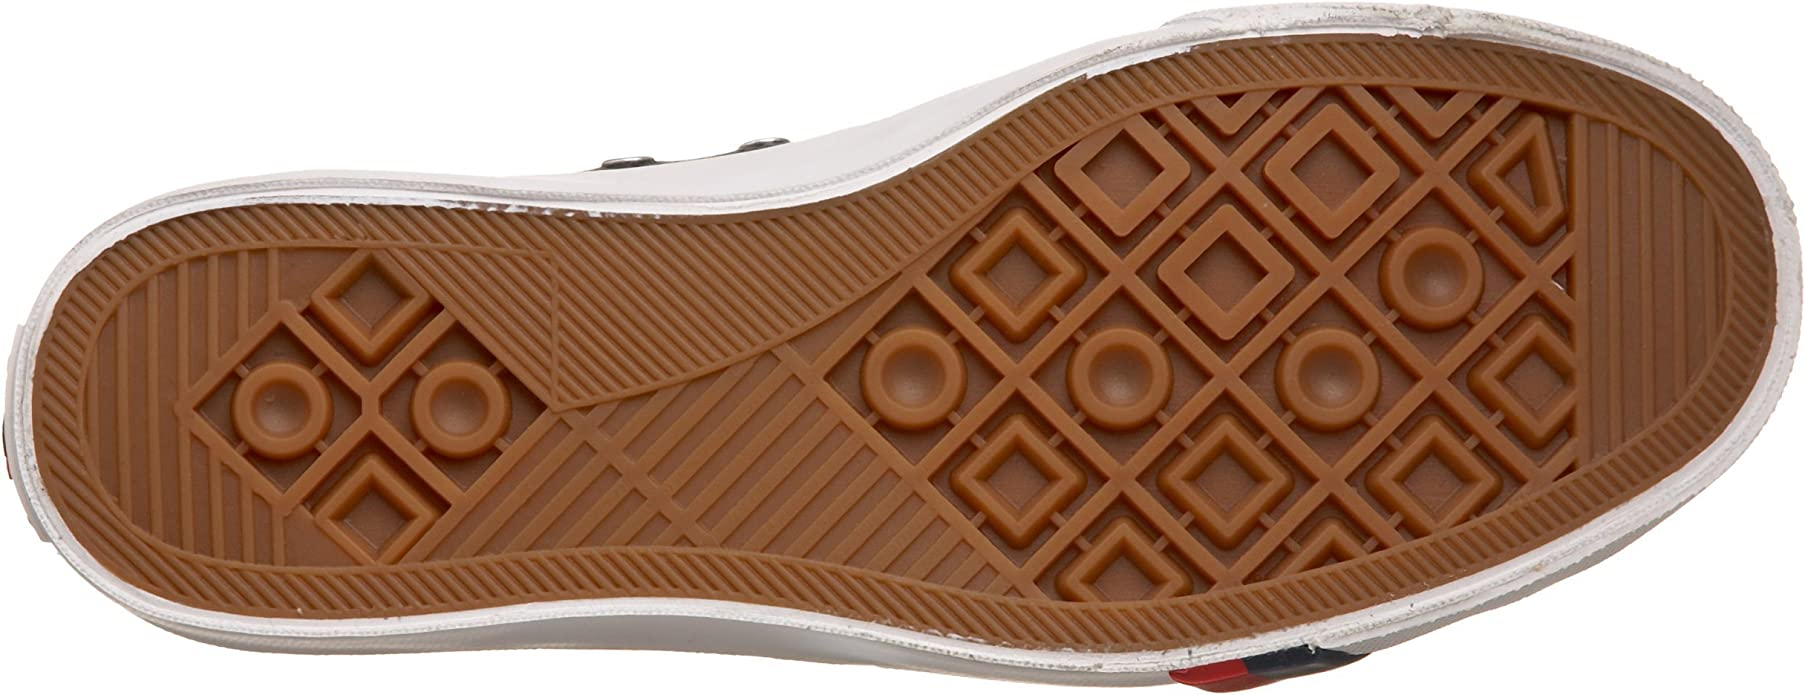 | PRO Keds Men's Royal Lo Leather Sneaker